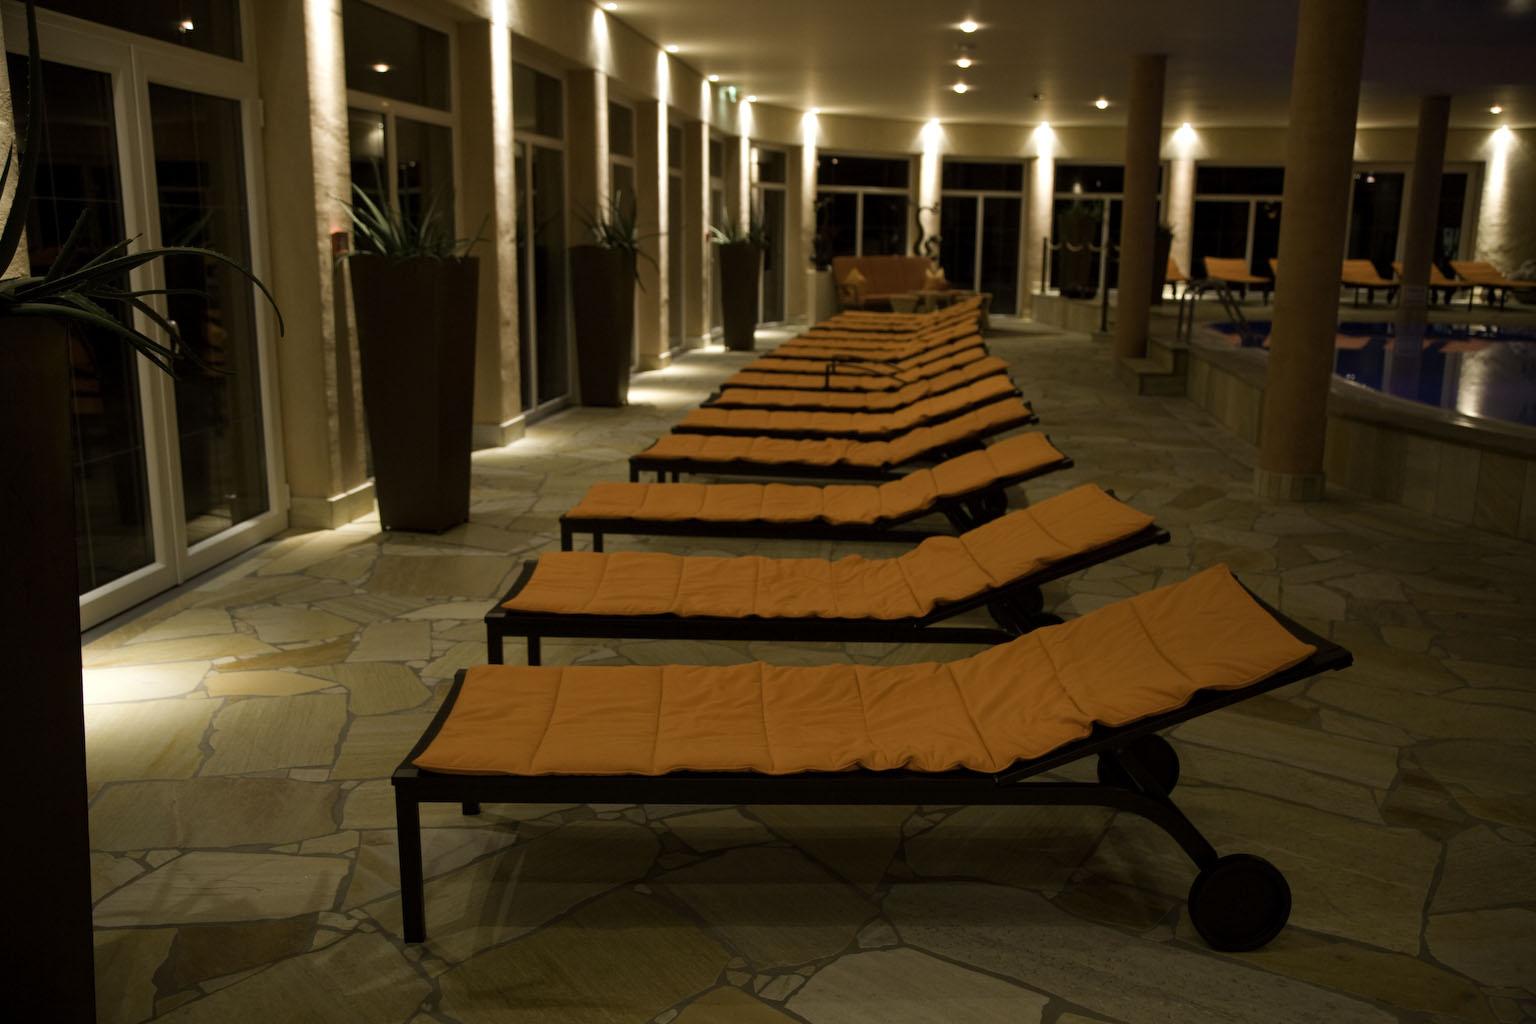 Gesichtsbehandlung: Foto vom Wellnesshotel Berghotel & SPA Feuriger Tatzlwurm   Wellness Bayern